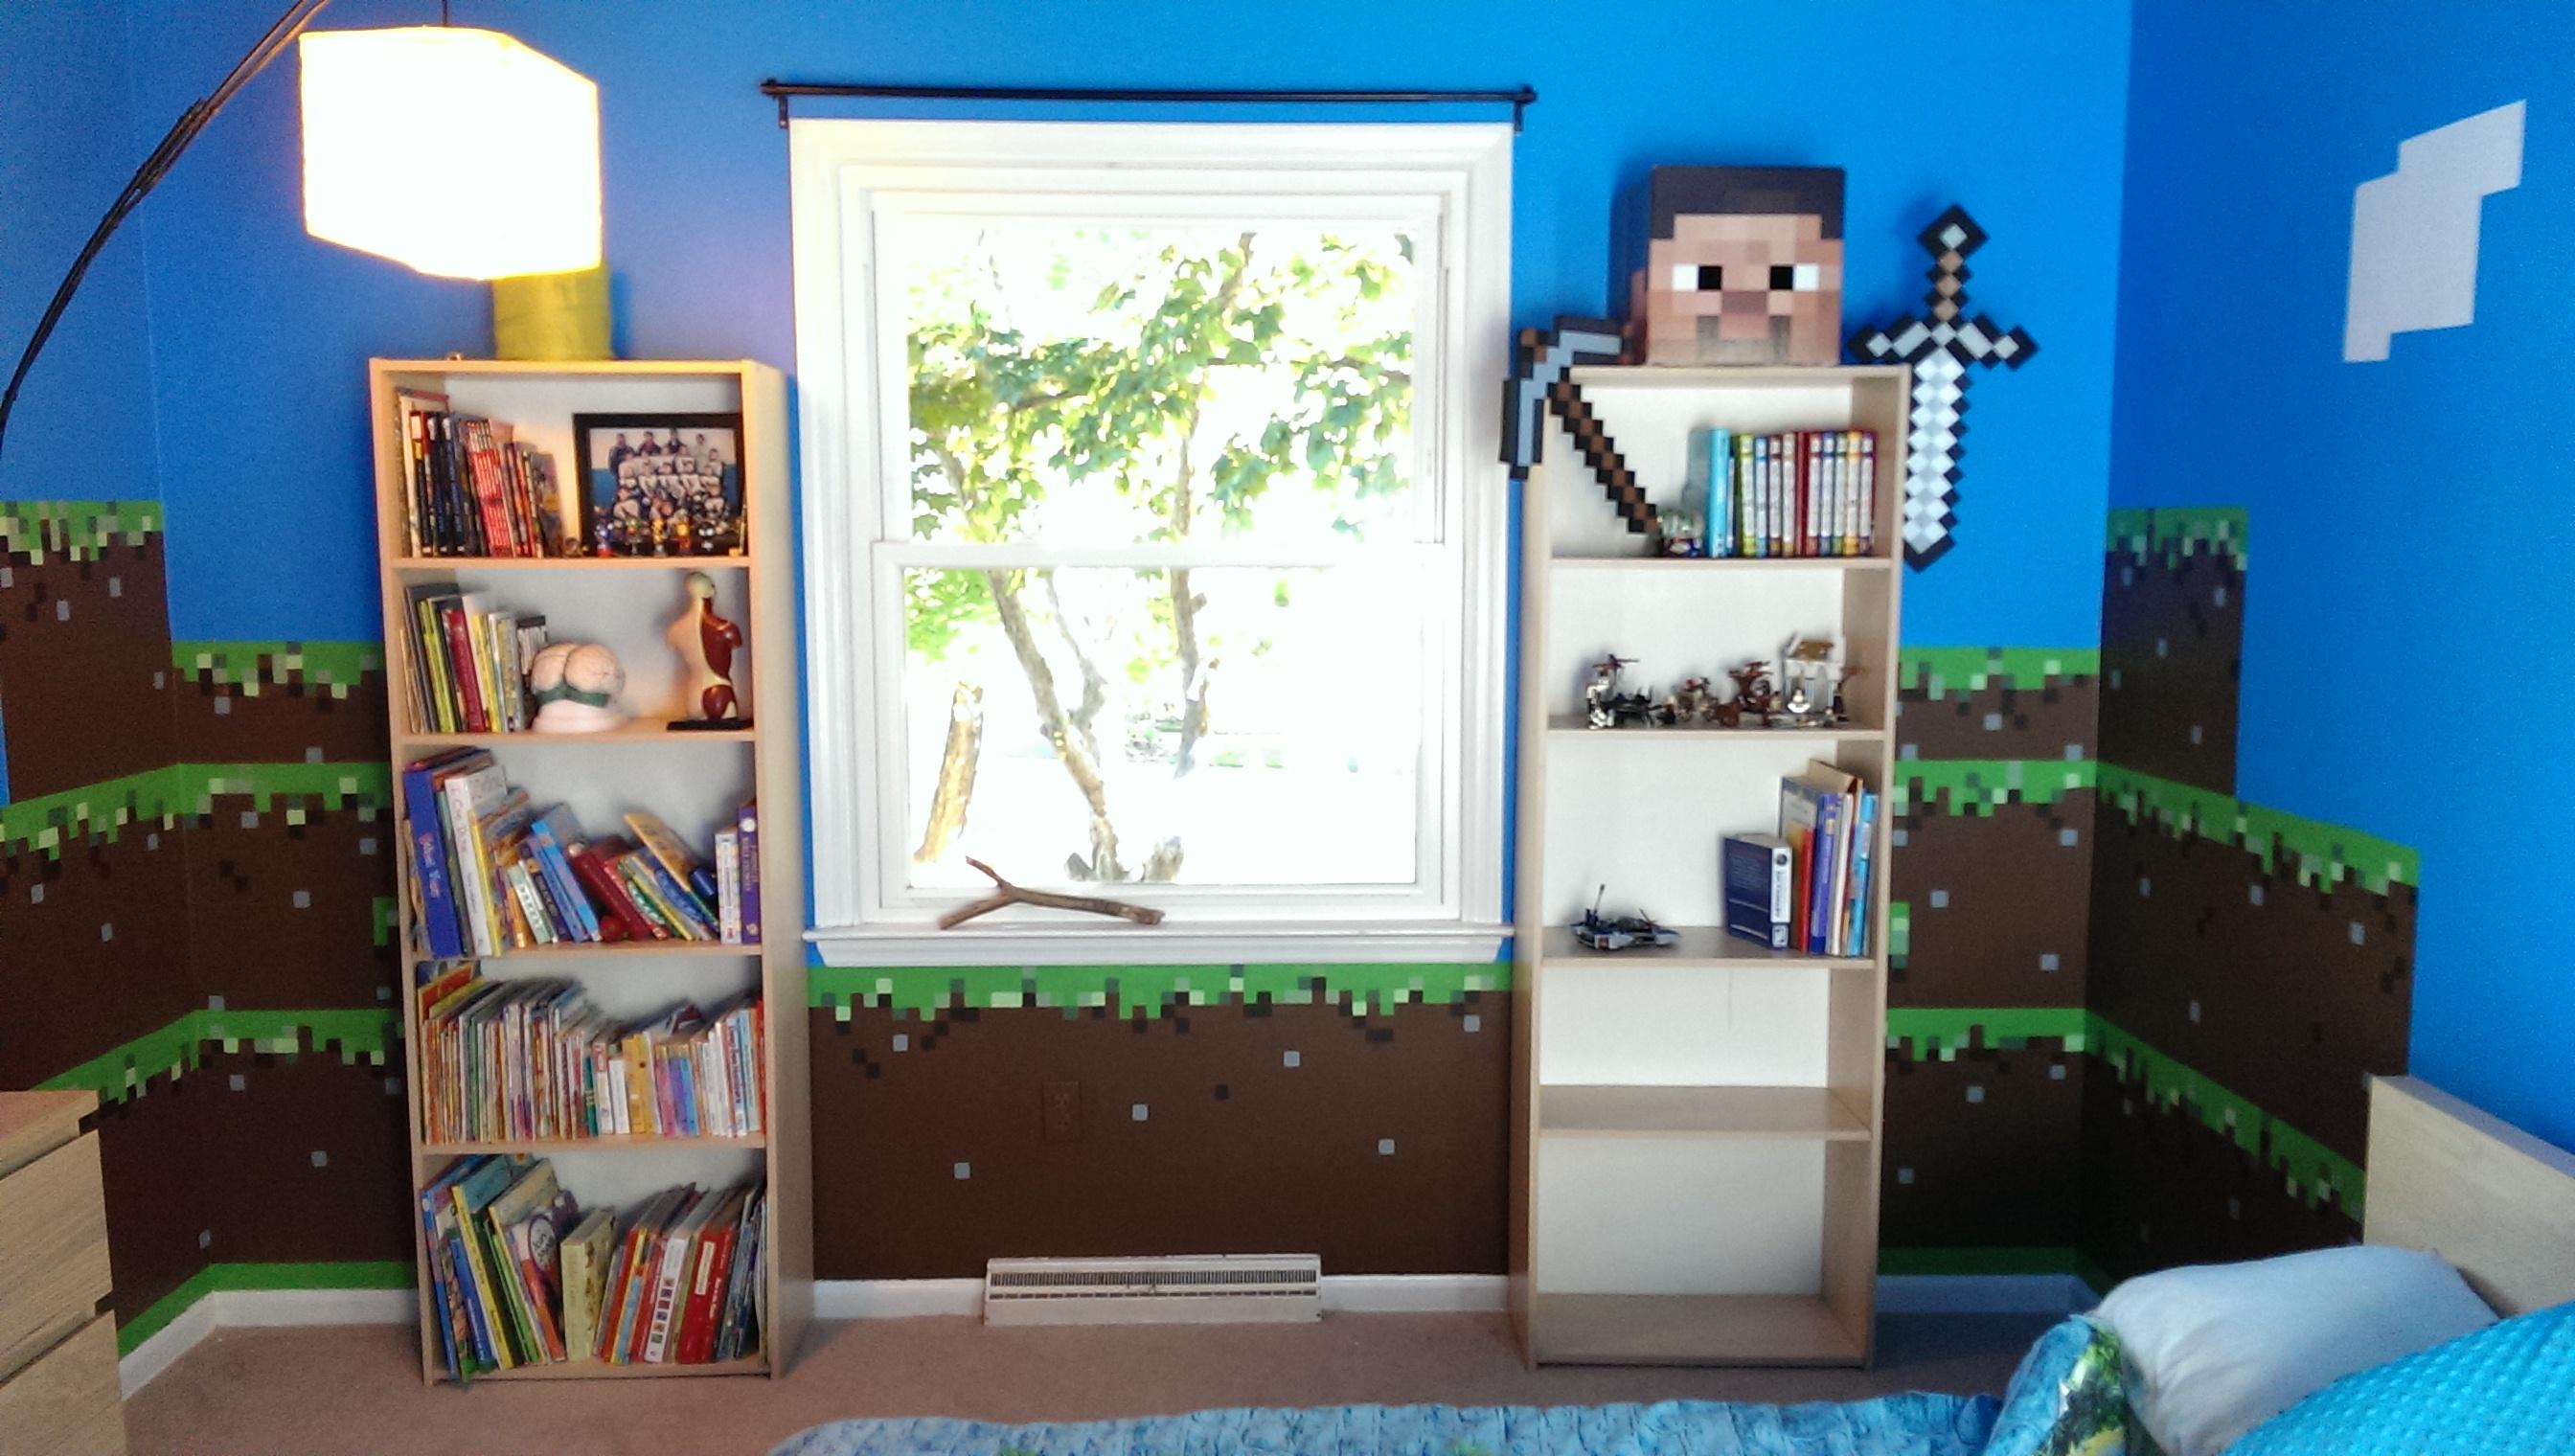 42 Realistic Wallpaper For Rooms On Wallpapersafari